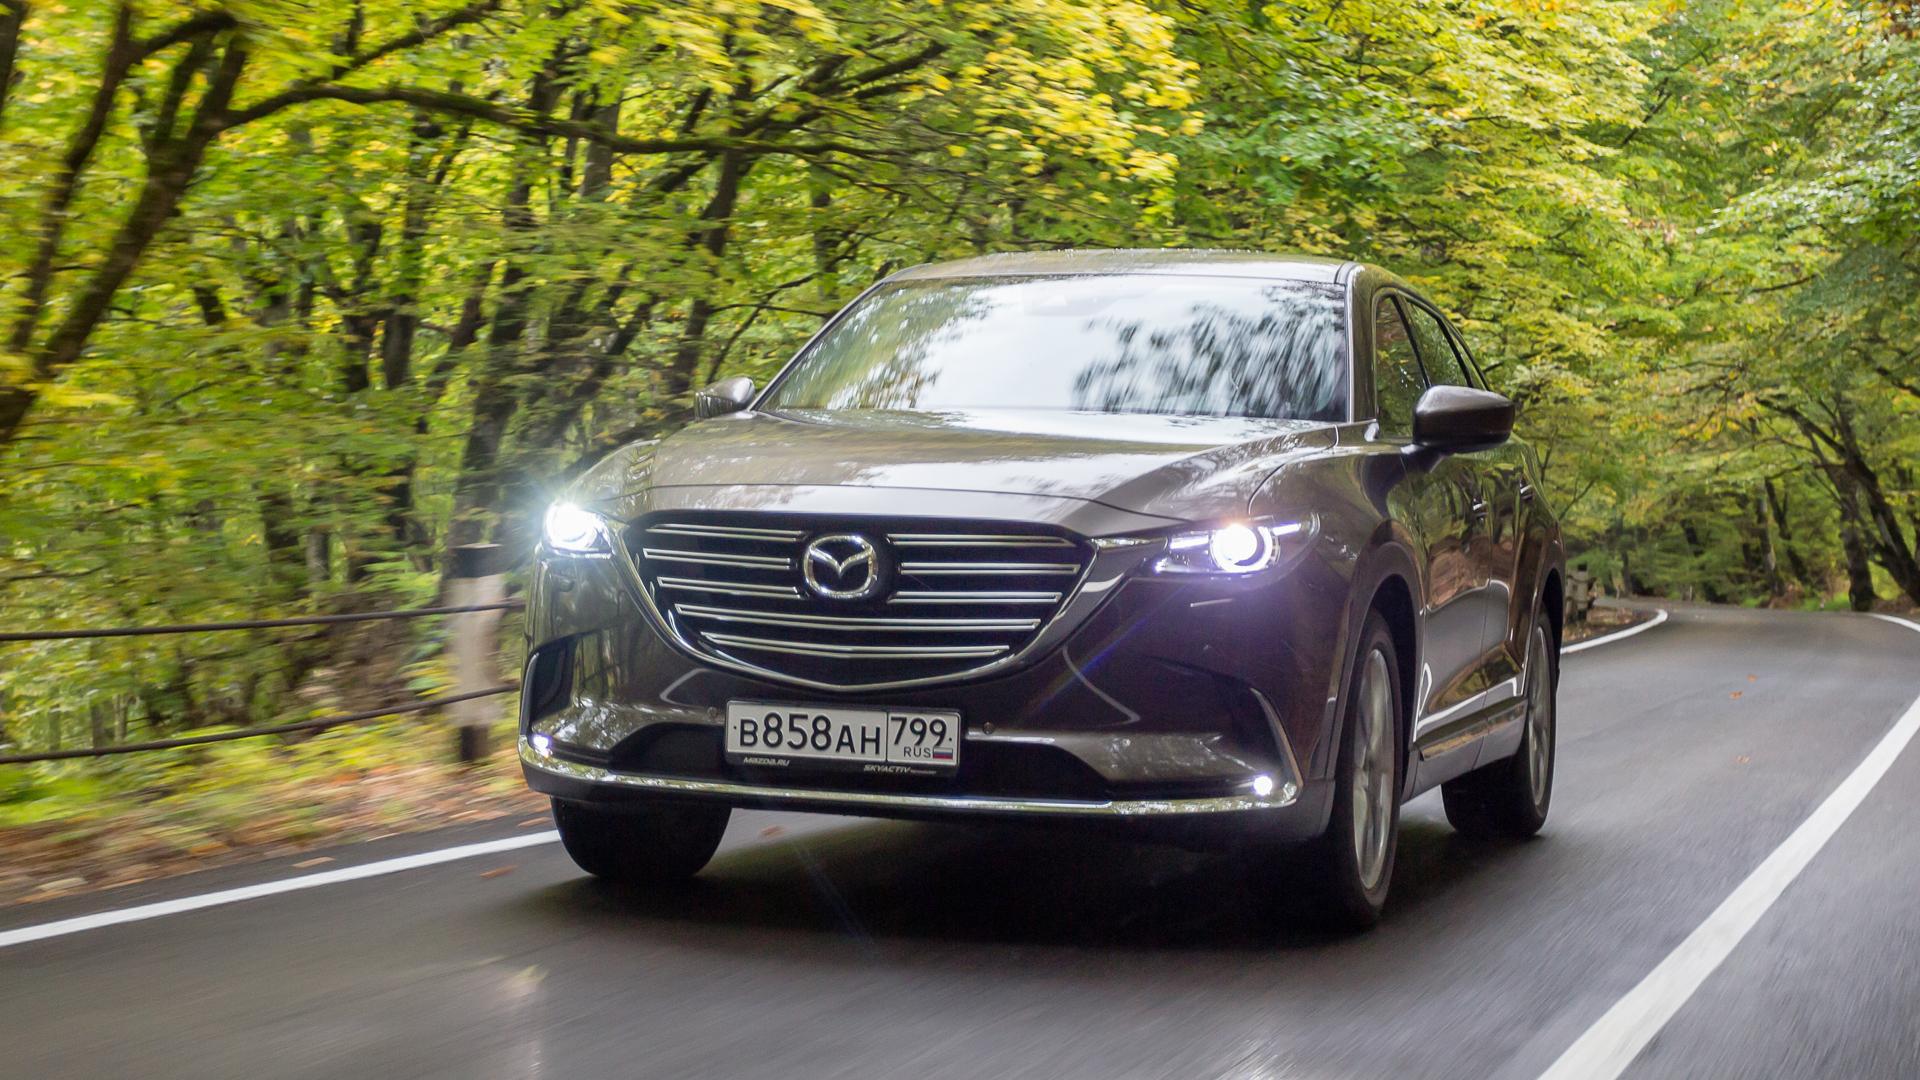 Тест-драйв Mazda CX-9 2019: Главное — внутри